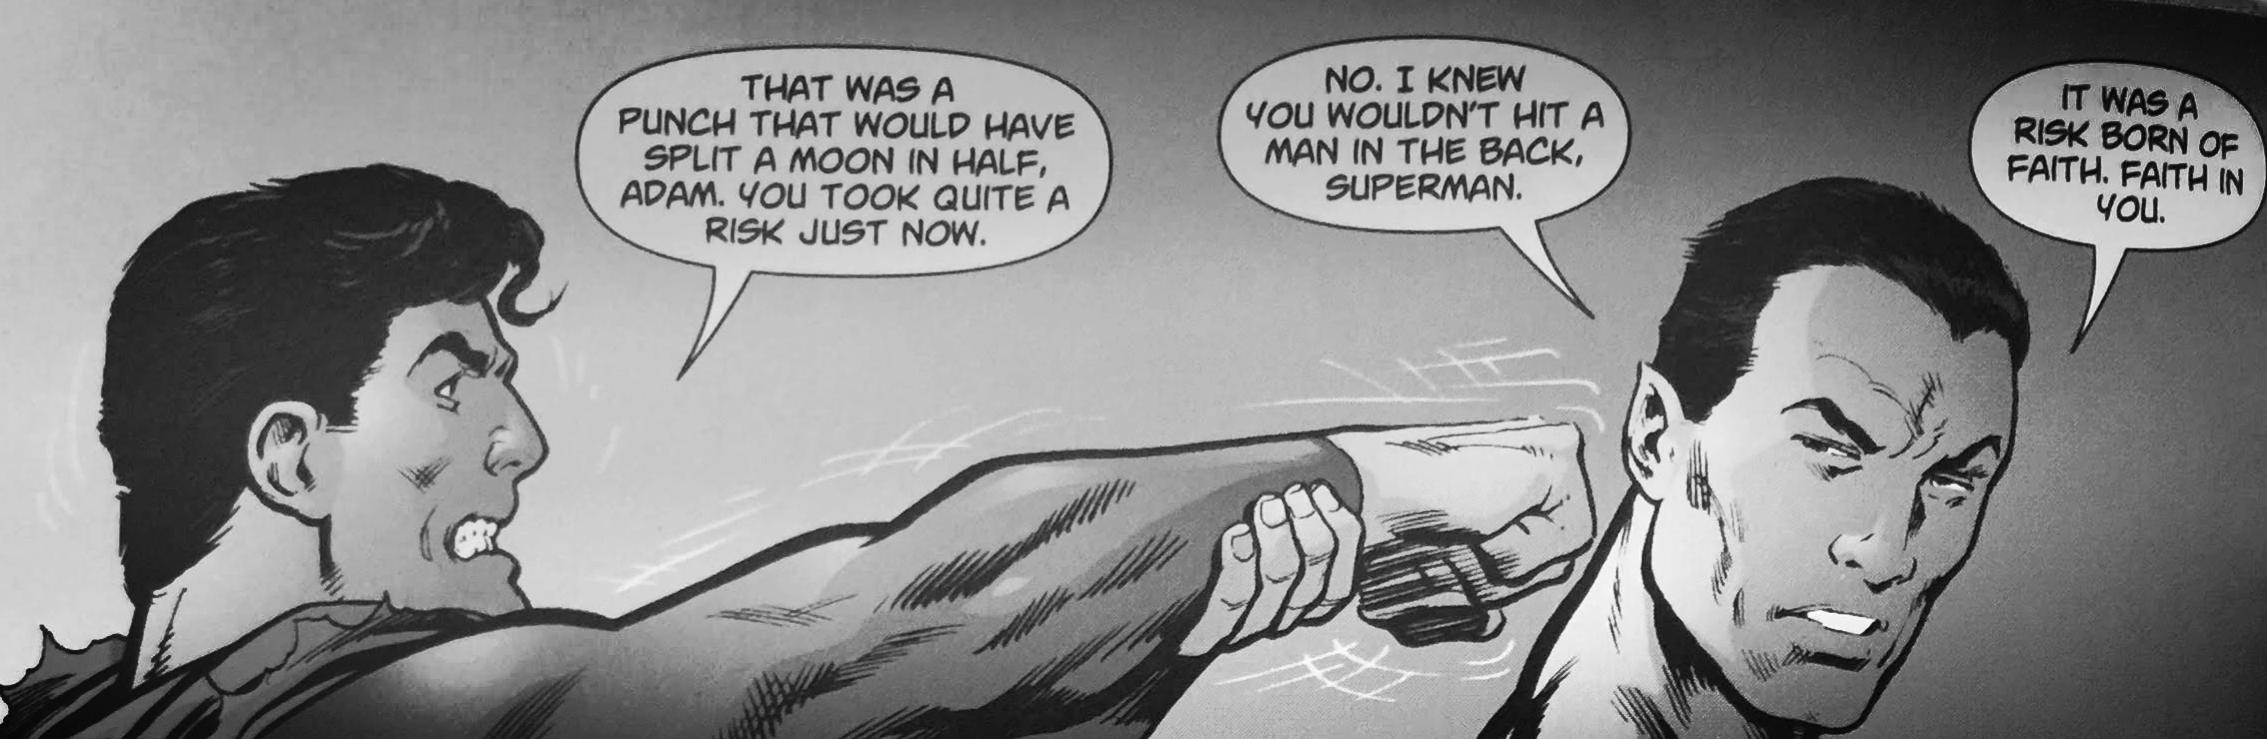 Black Adam turns away from Superman Action Comics #831